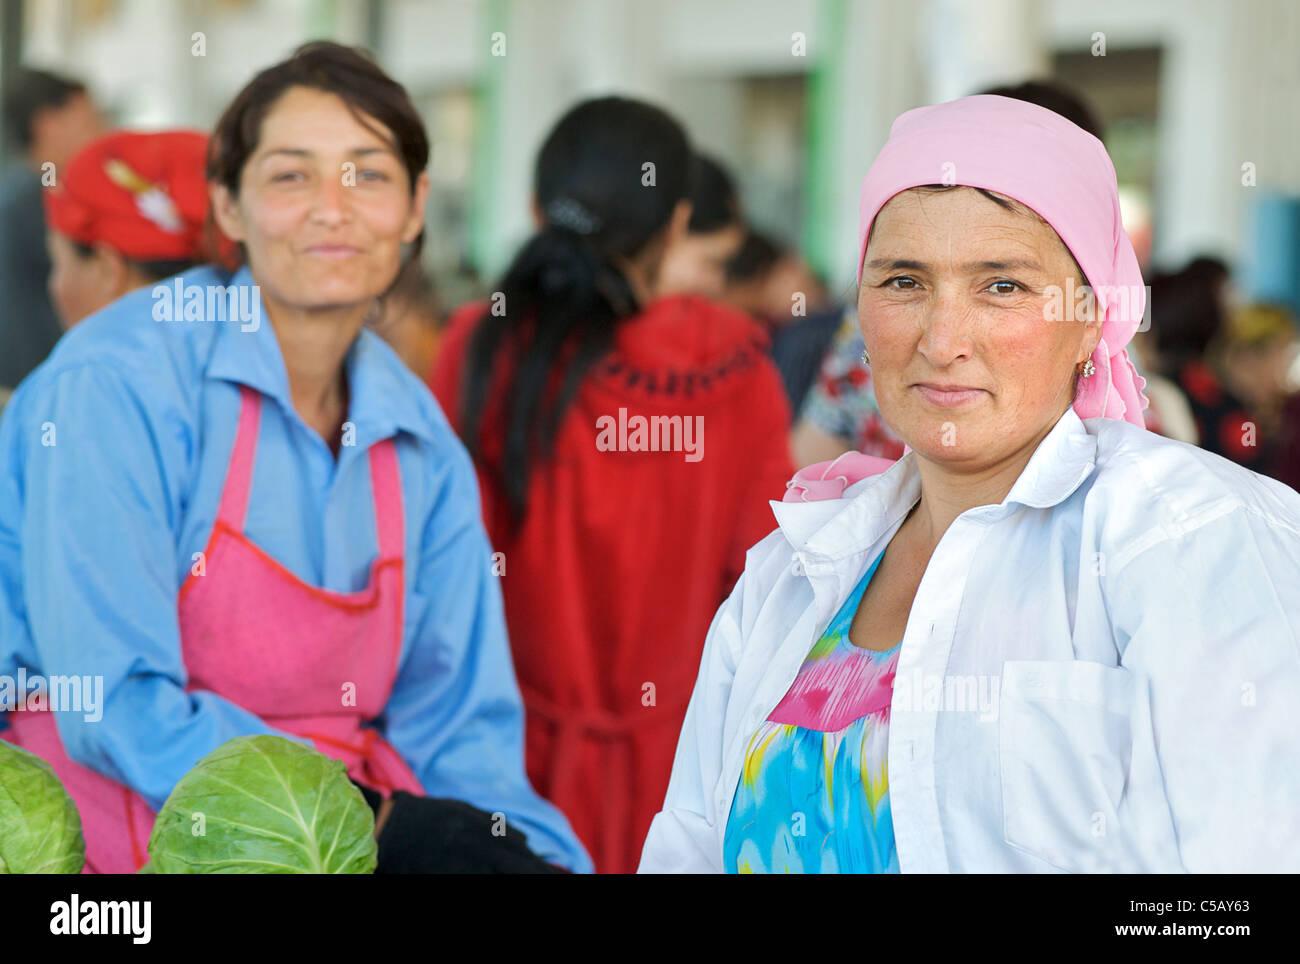 Portrait of market vendor, Samarkand market, Uzbekistan - Stock Image